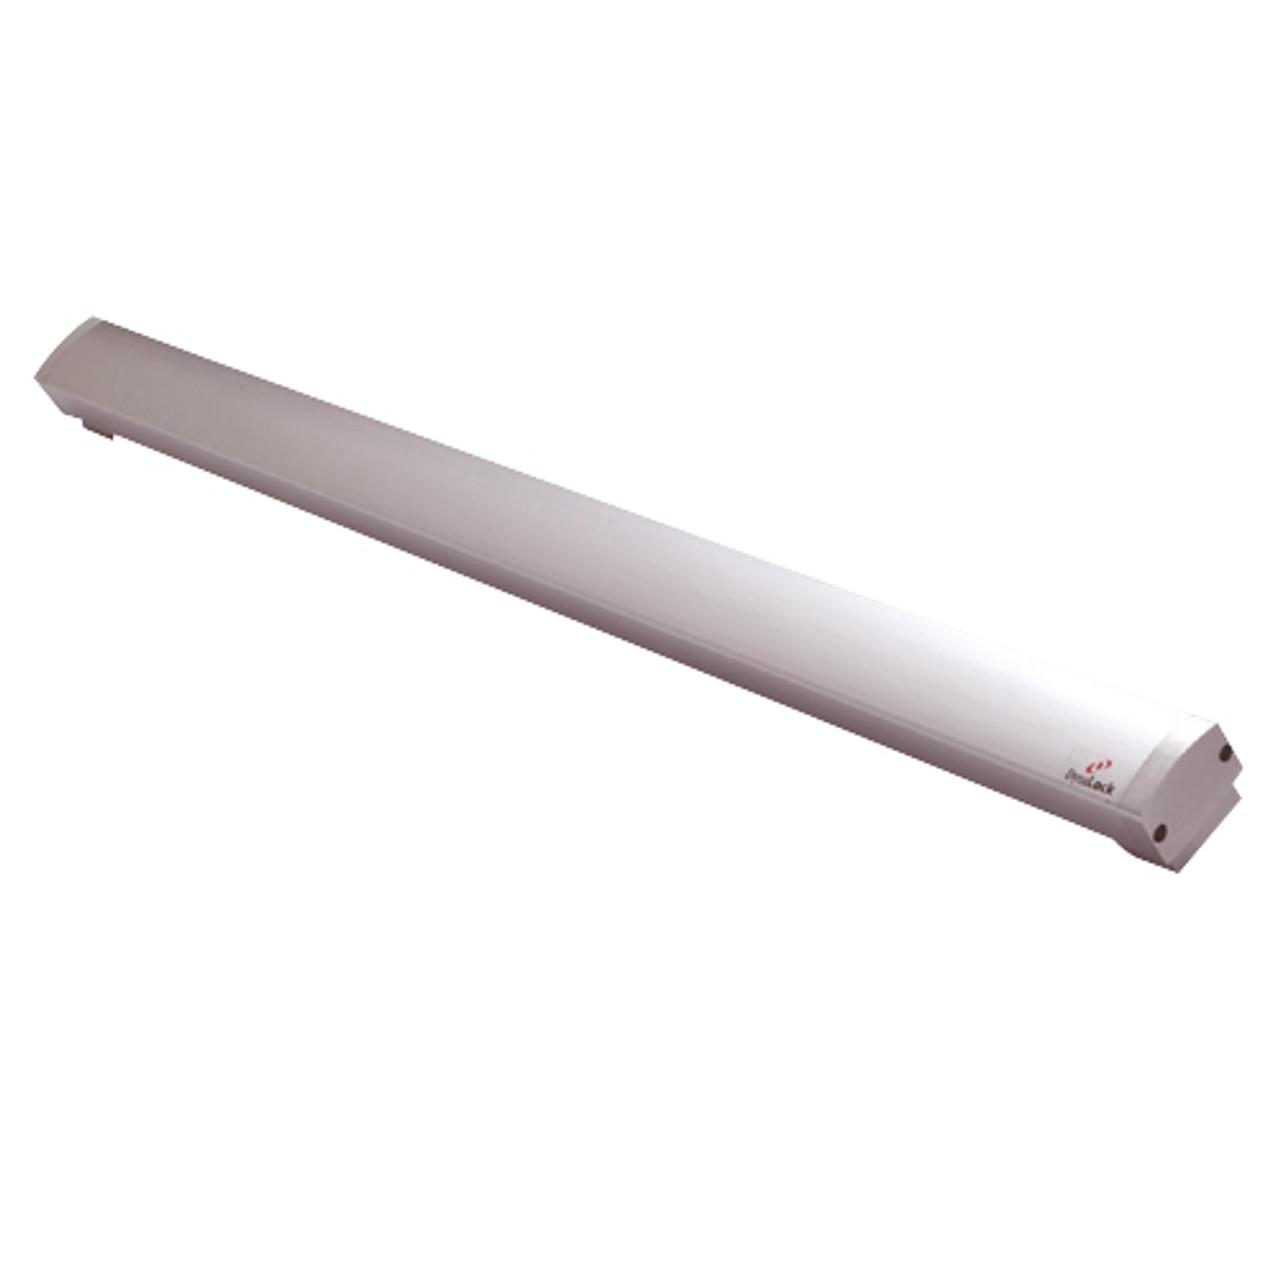 6451-36-US28 DynaLock 6451 Series Exit Sensor Bar for 36 inch Door in Satin Aluminum